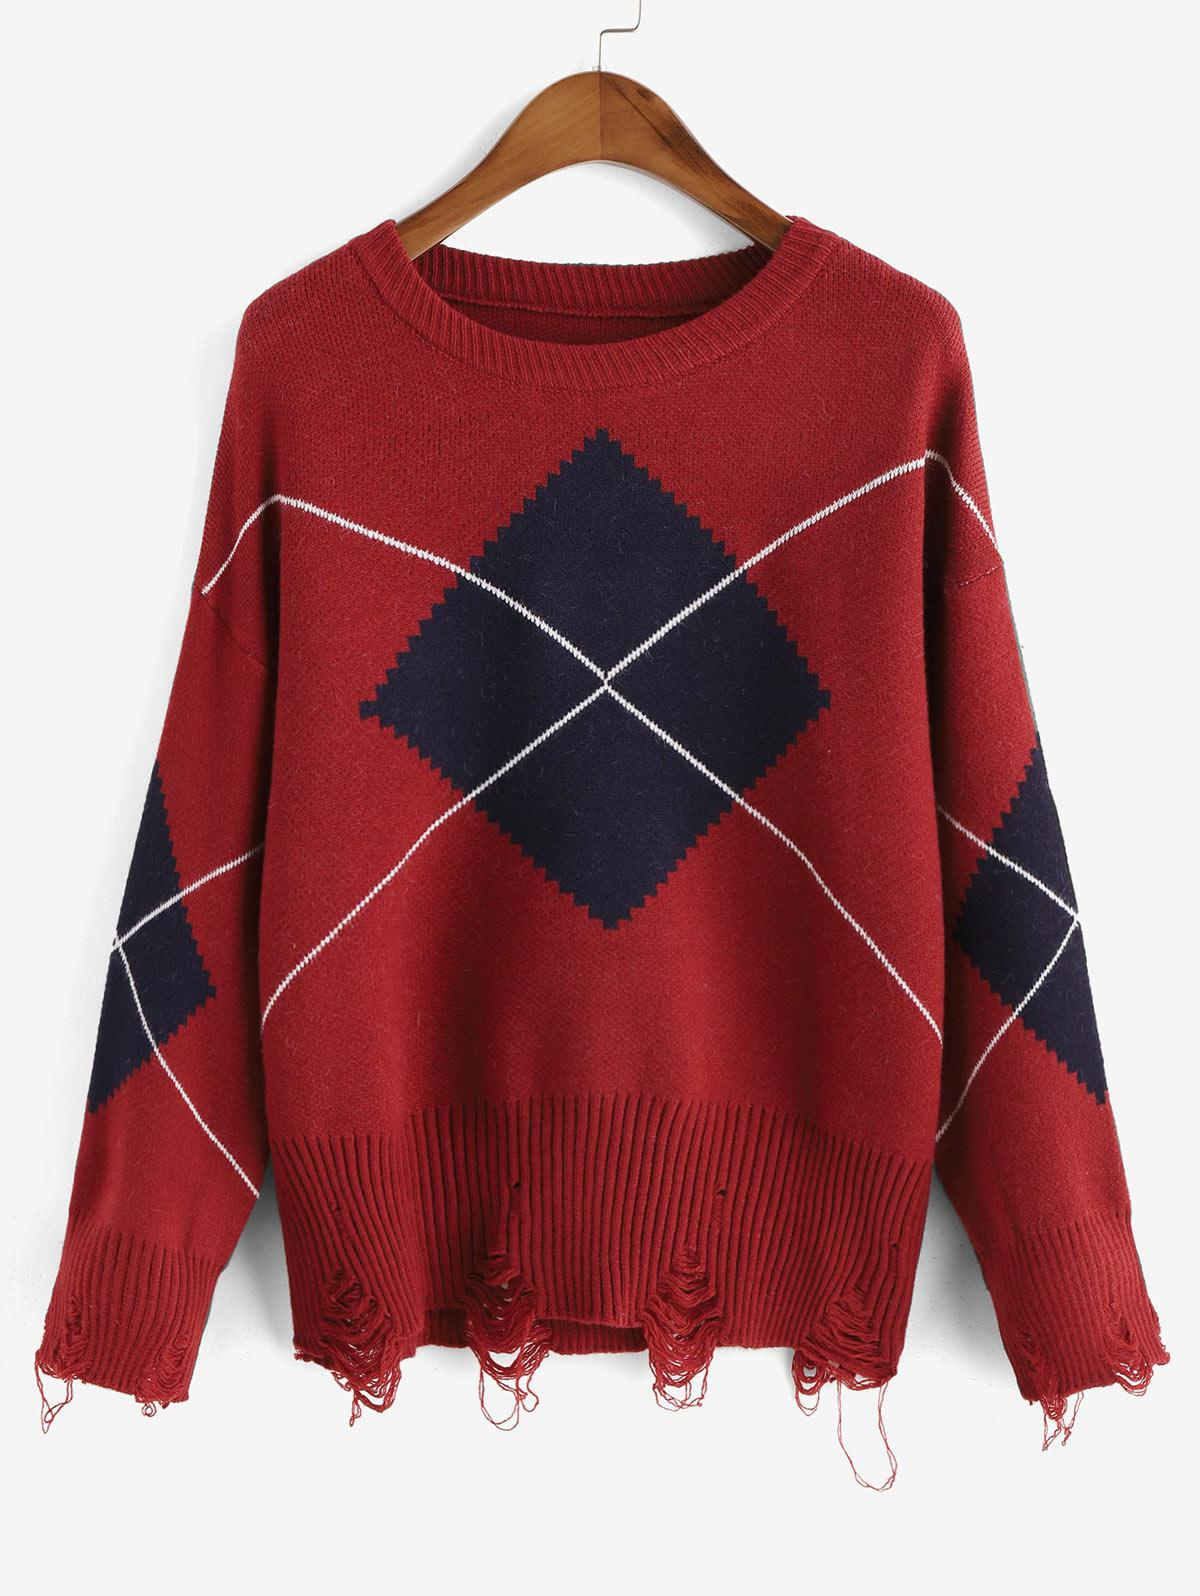 Crew Neck Distressed Geometric Graphic Sweater